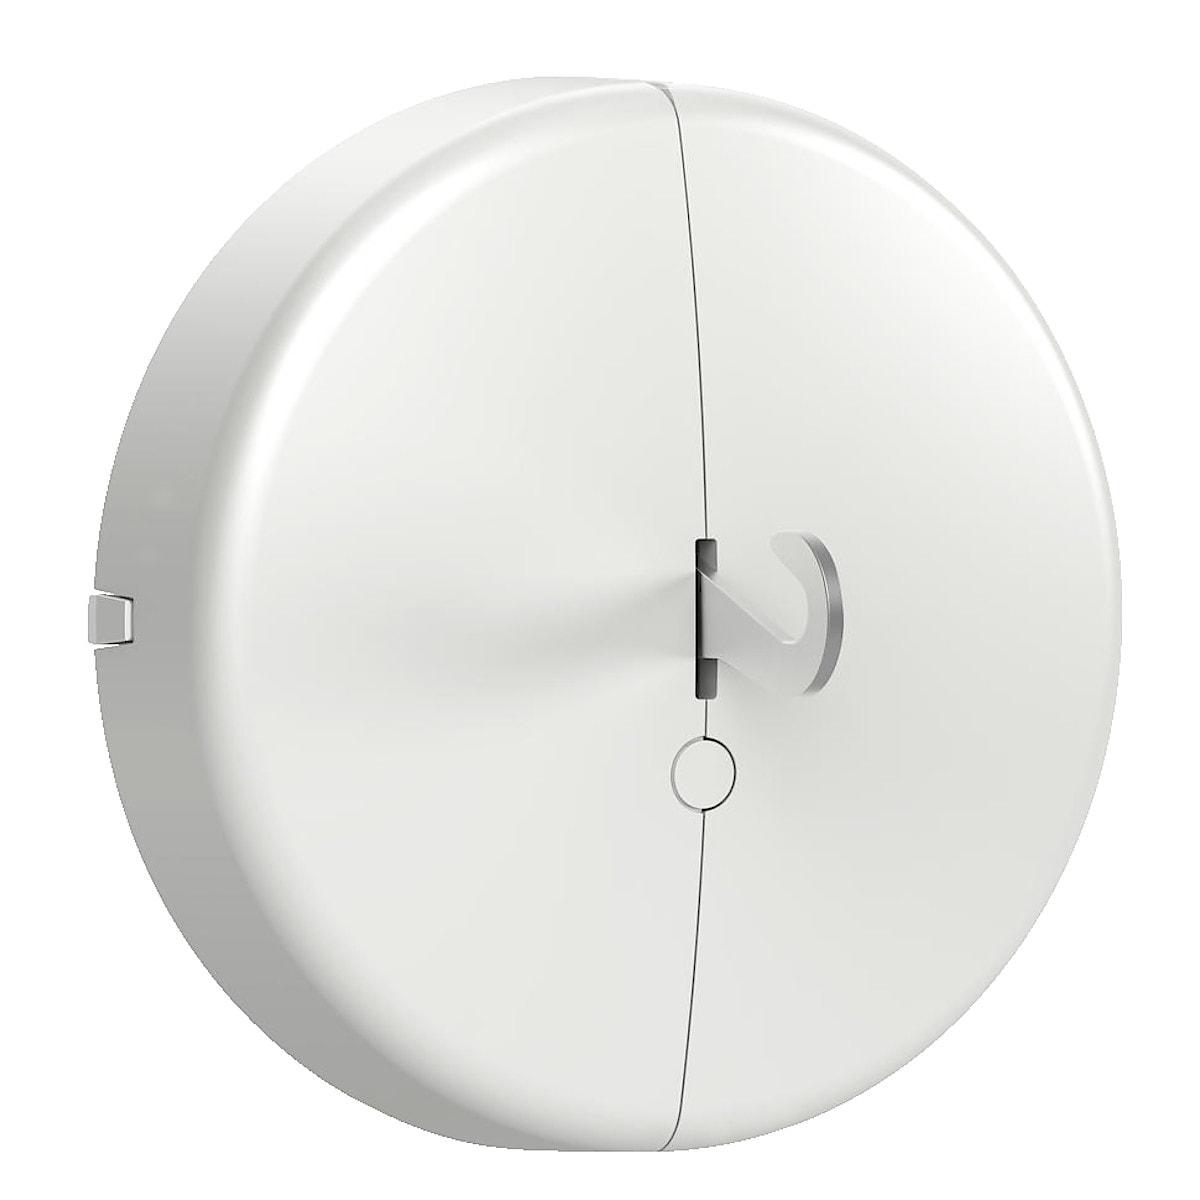 DCL strømuttak for lampe i tak, utenpåliggende | Clas Ohlson